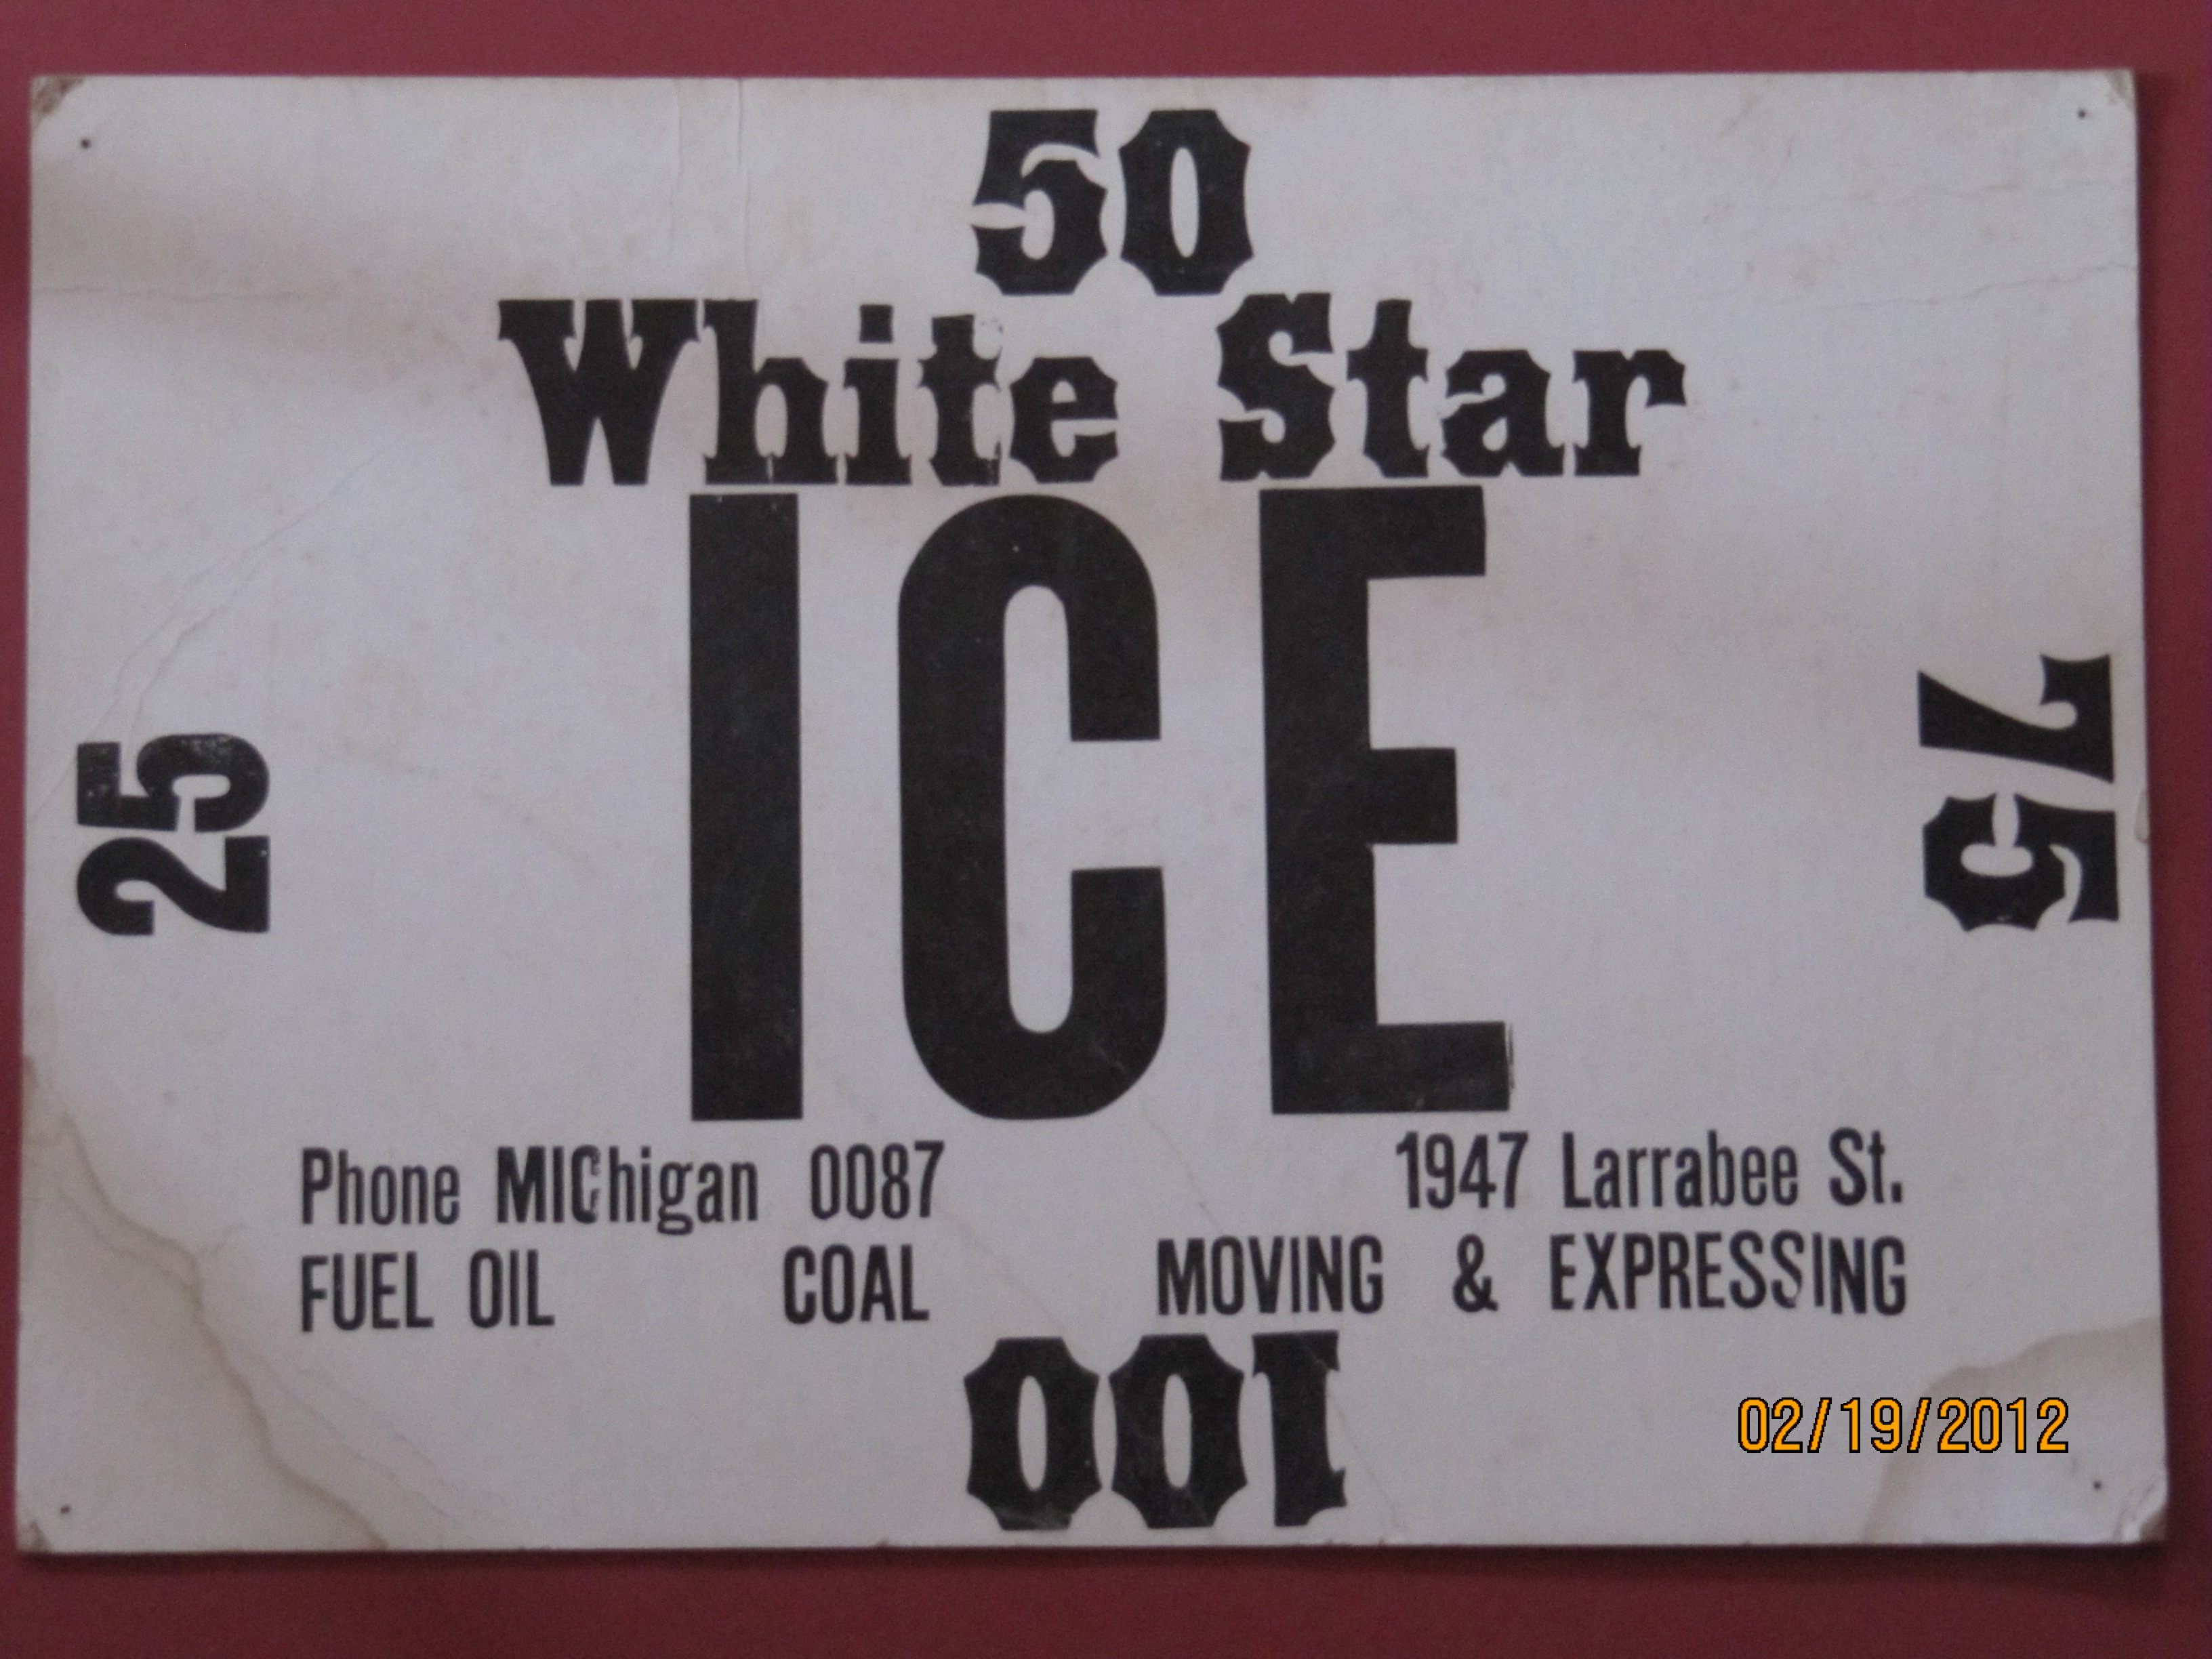 White Star Ice